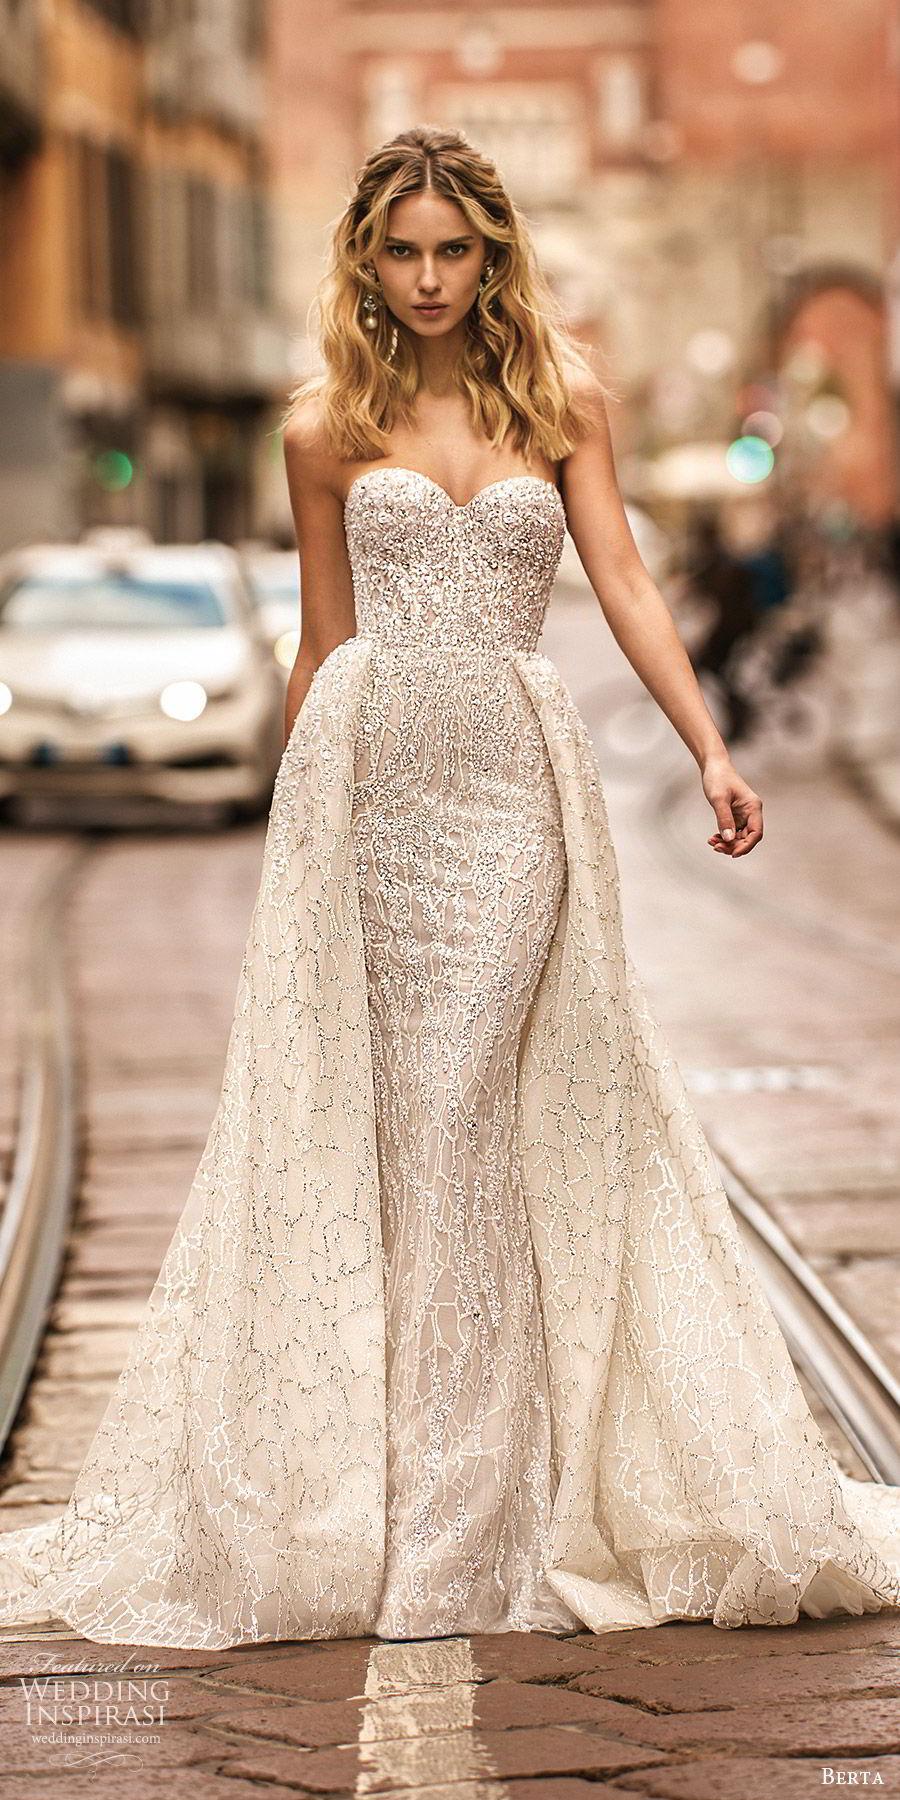 berta spring 2020 bridal strapless sweetheart fully embellished sheath wedding dress beaded ball gown overskirt (17) glitzy glam modern chapel train mv